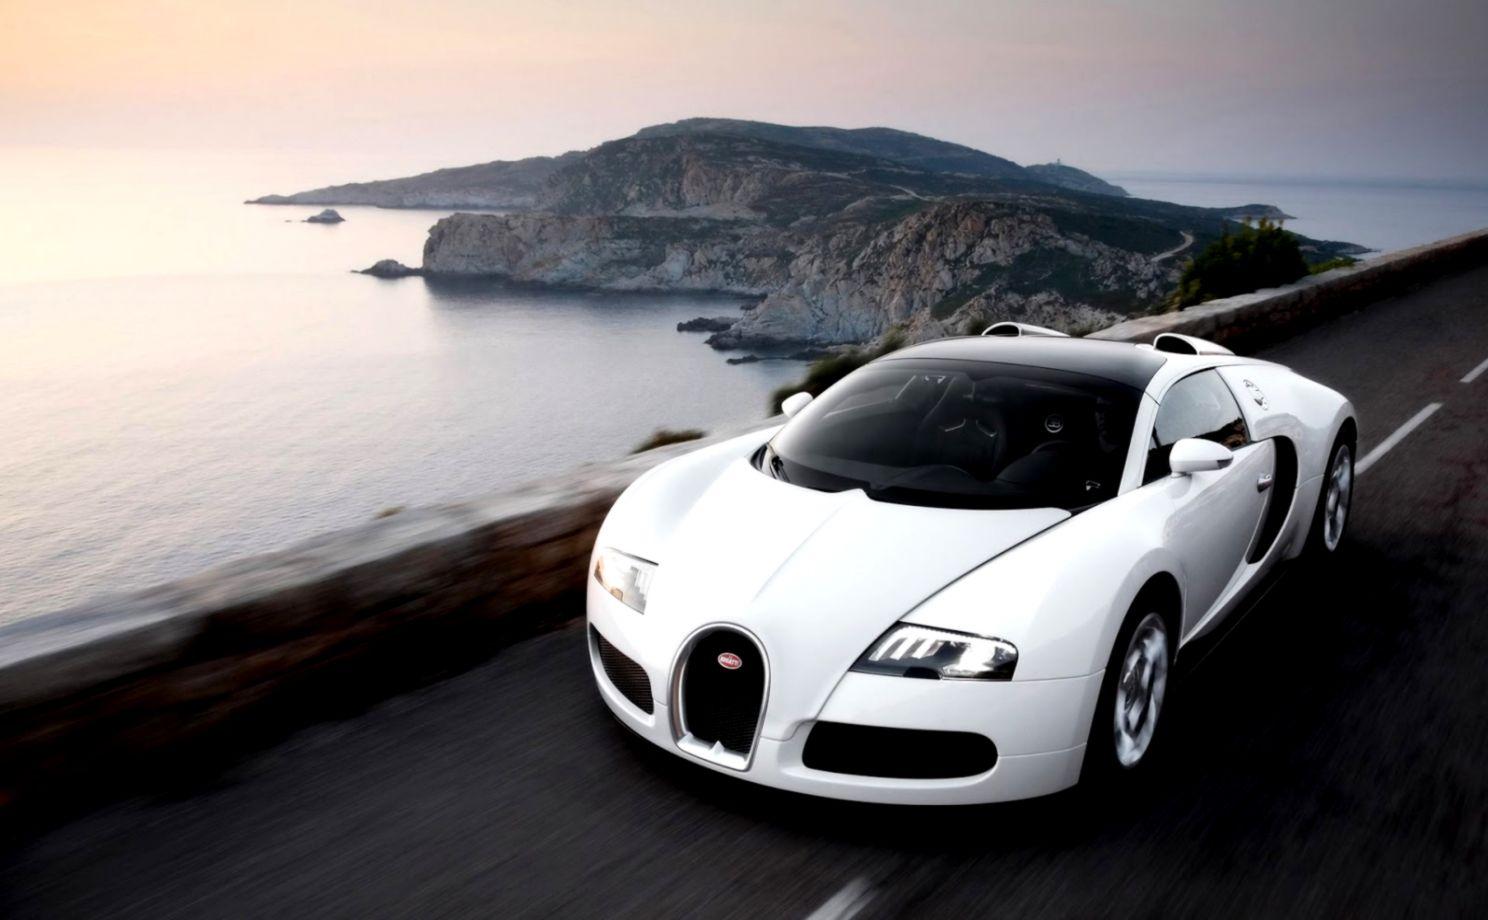 Bugatti Veyron Super Sport Wallpaper Free Wallpapers Photos